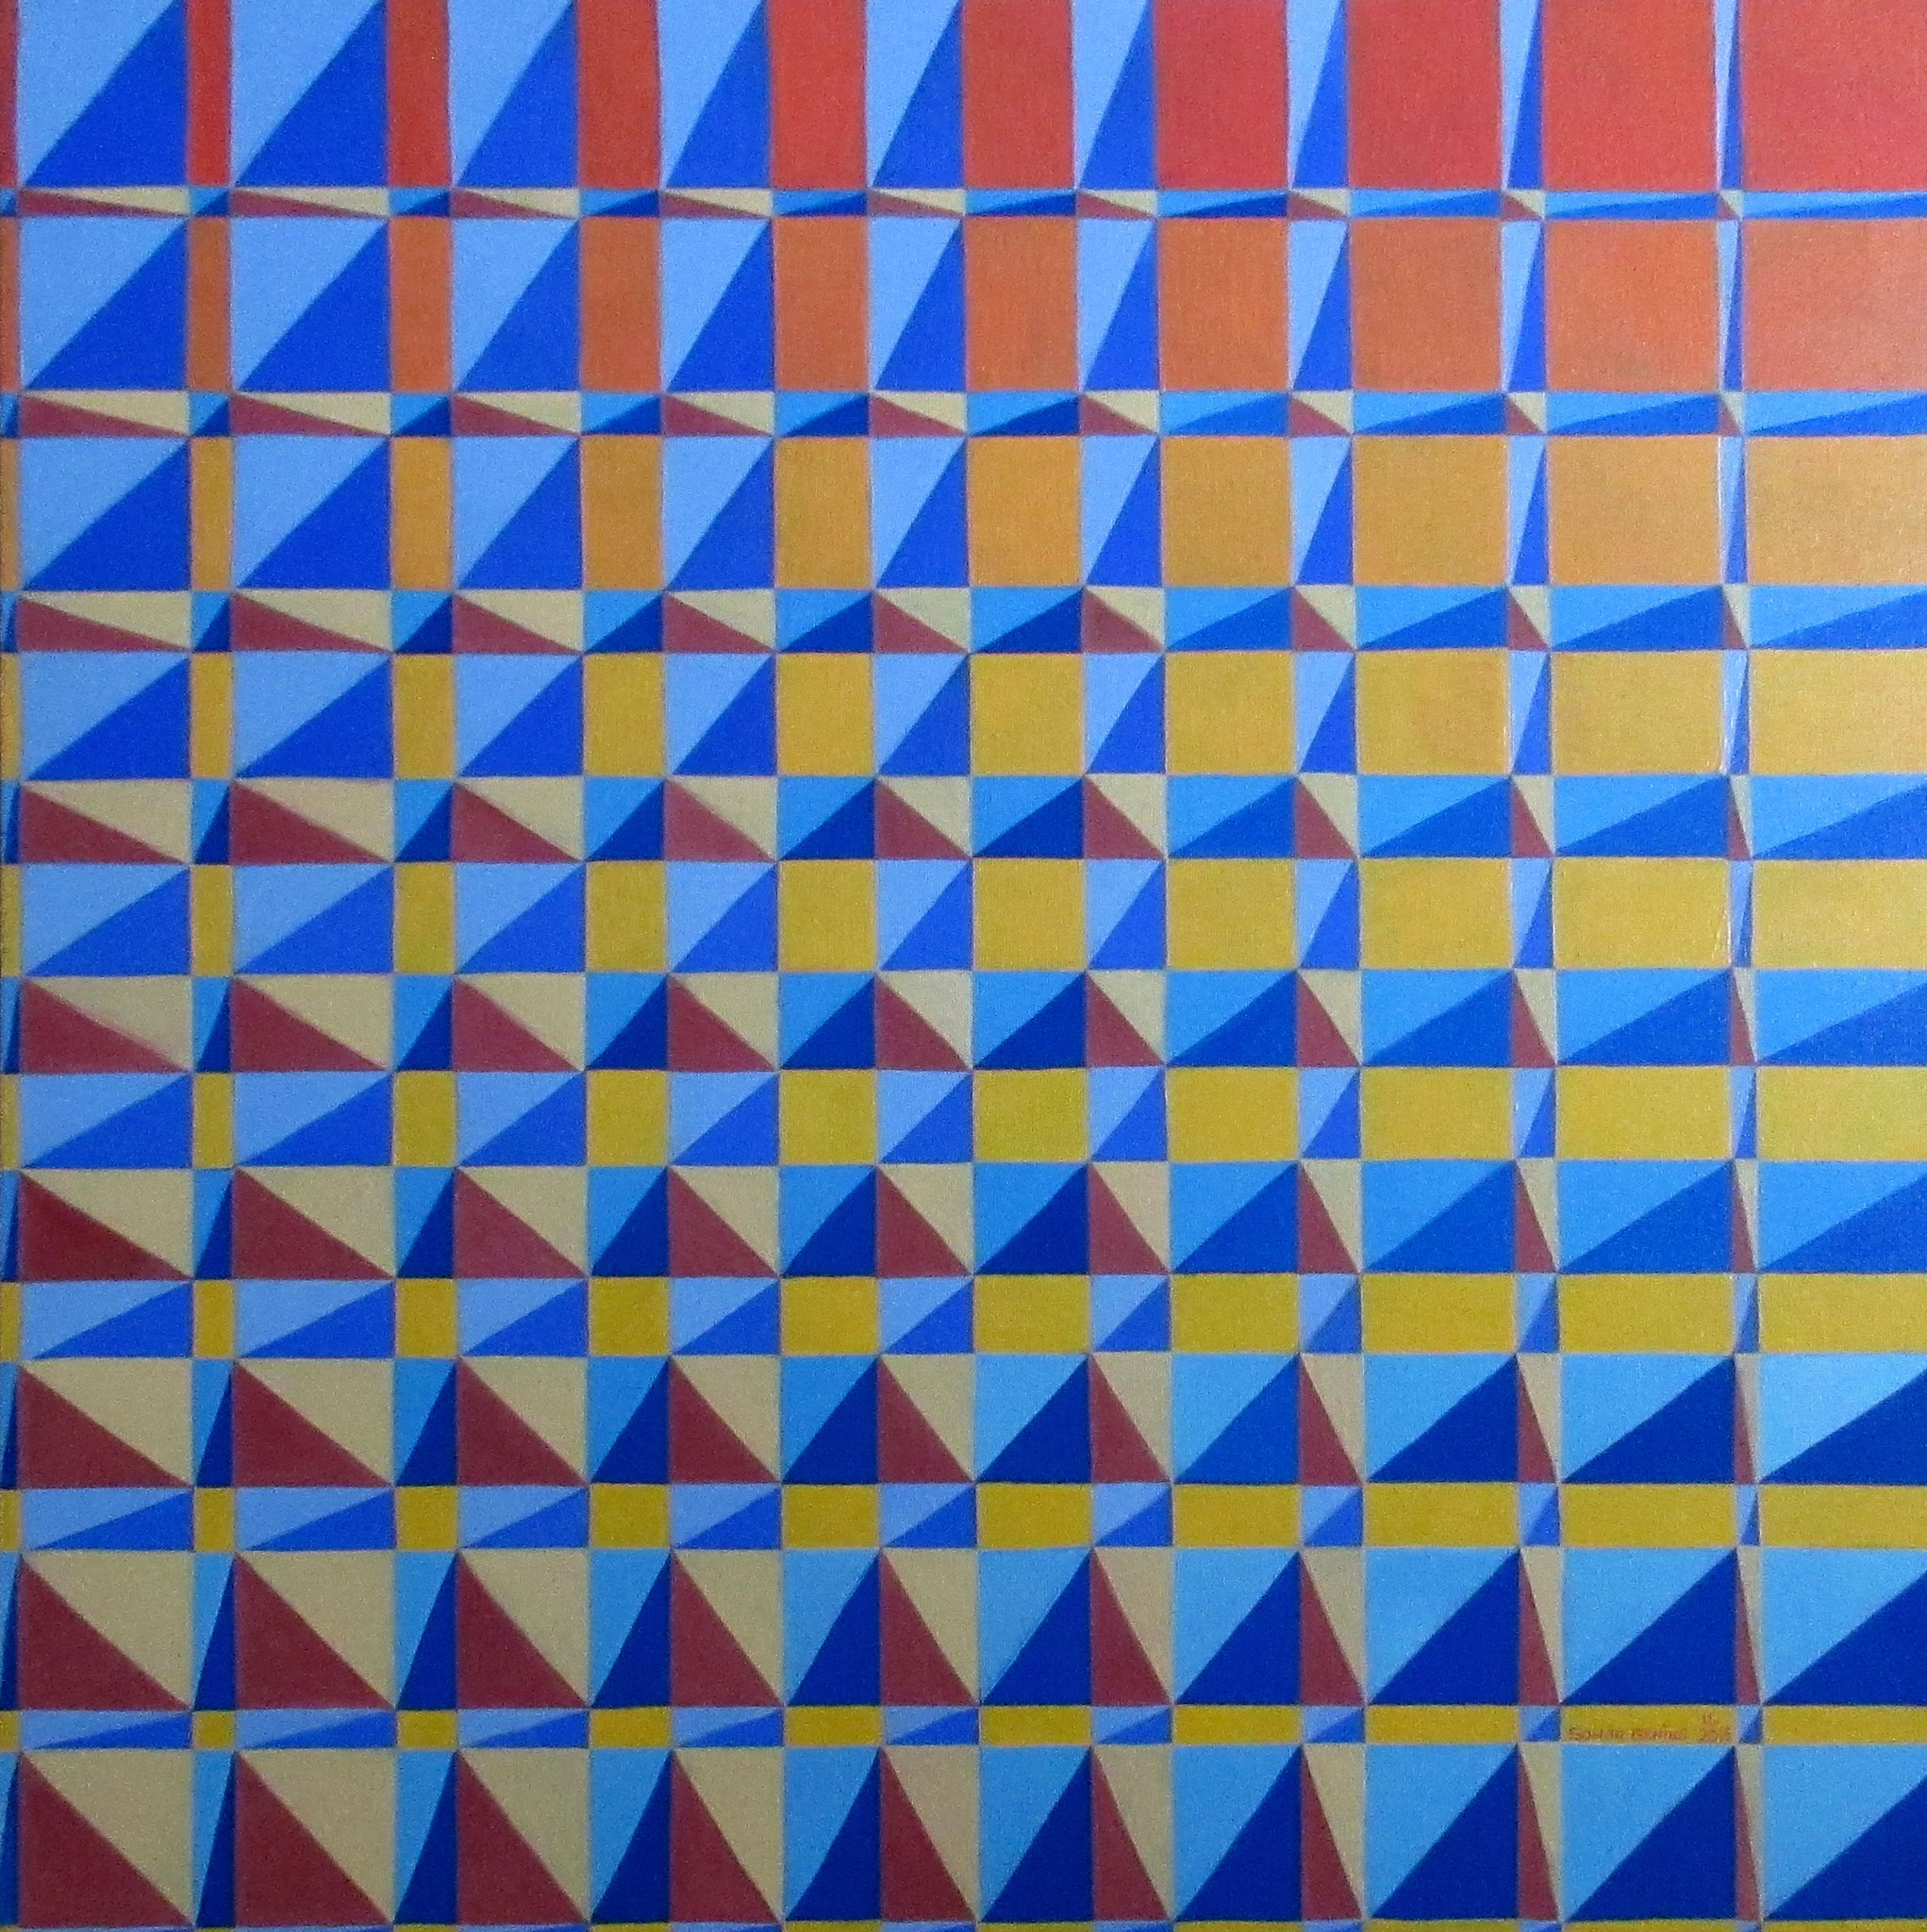 Untitled V, oil on canvas 24x24, November 2016 - (5)